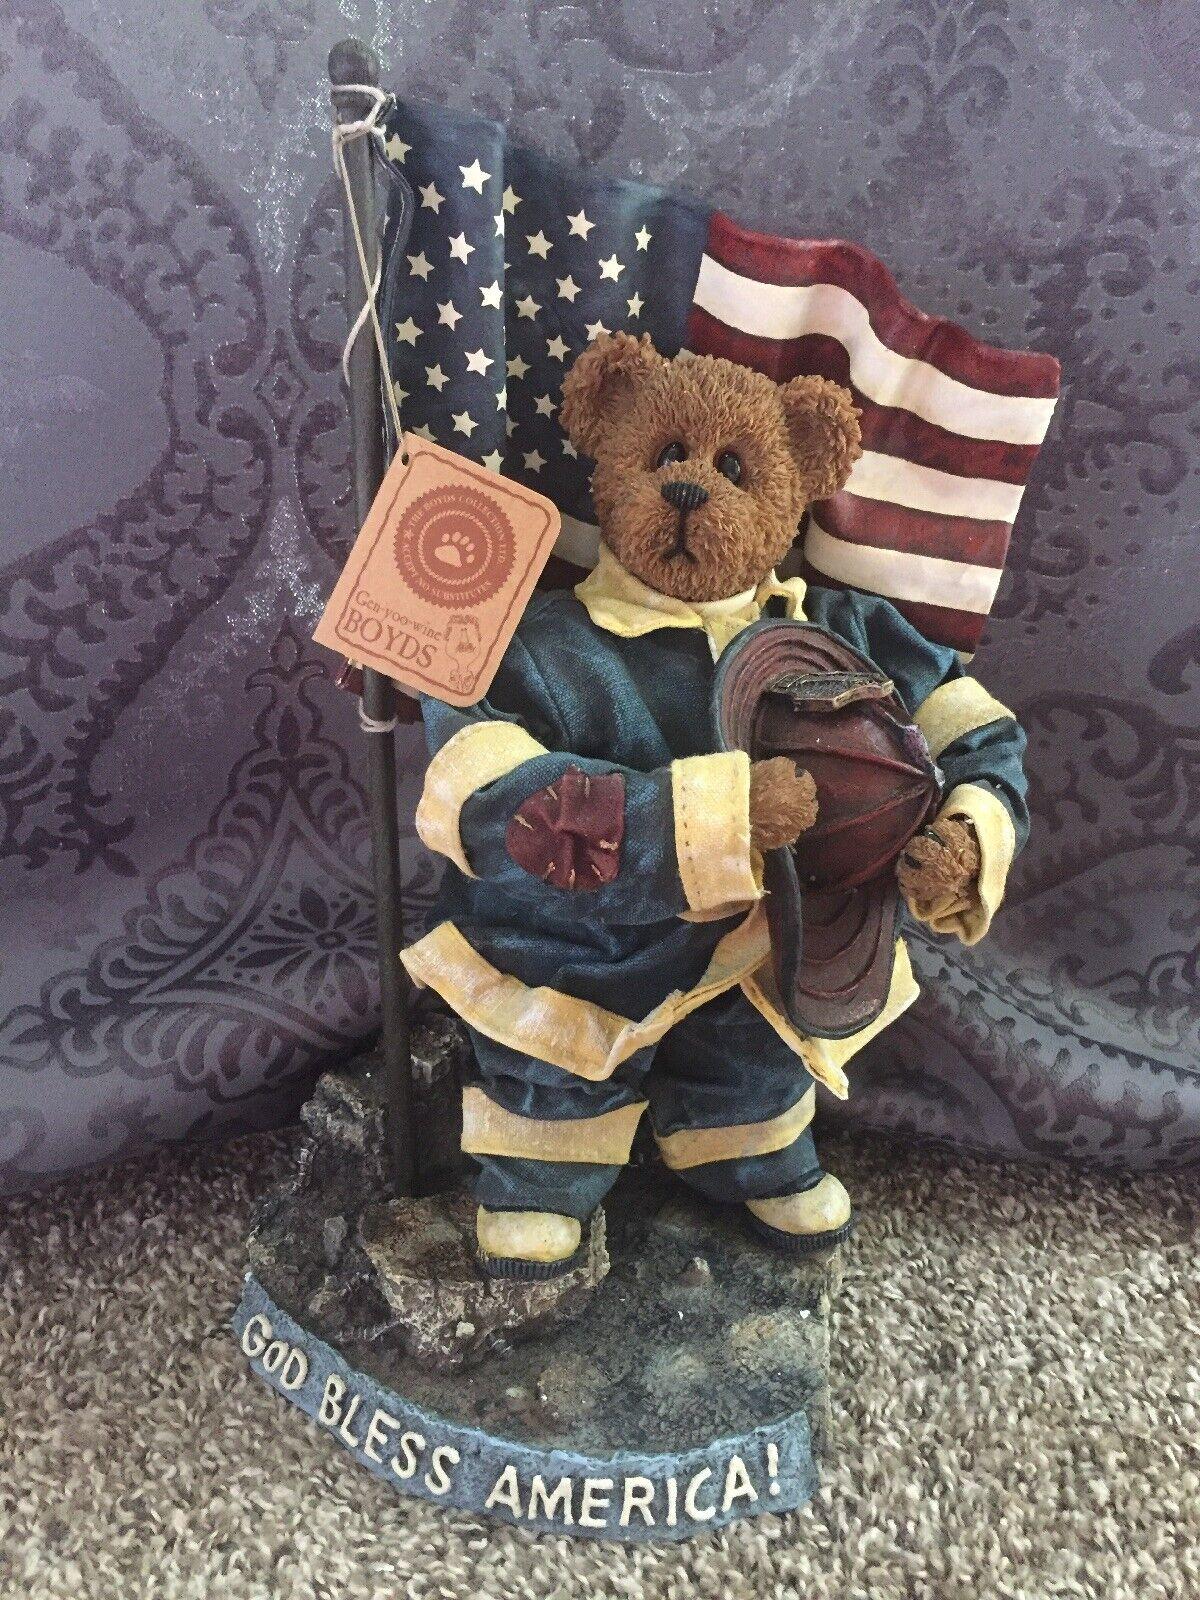 BOYDS BEARS CRUMPLETON OUR AMERICAN HERO FIREFIGHTER 73110 GOD BLESS AMERICA NIB